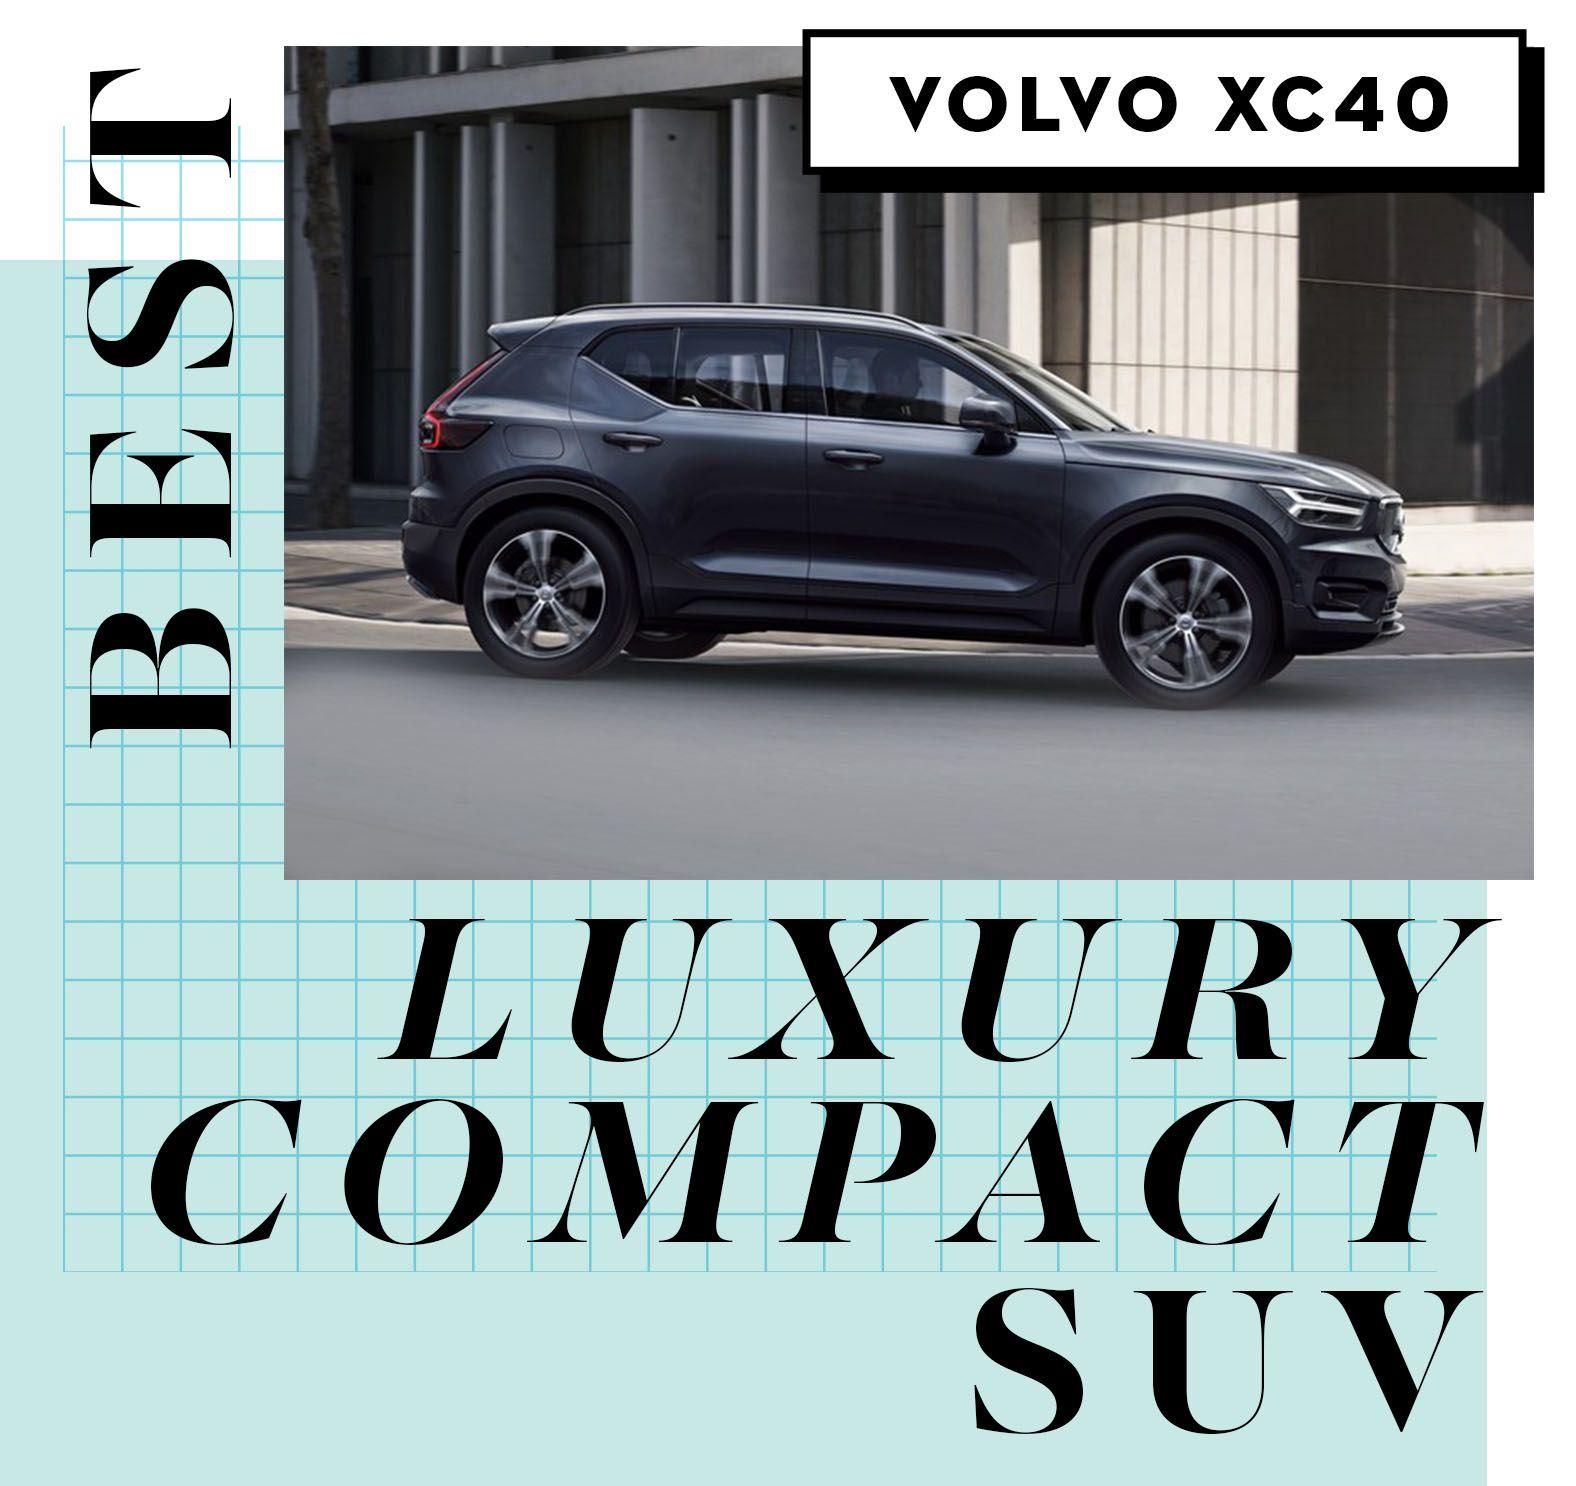 2020 Volvo XC40 Good Housekeeping Award